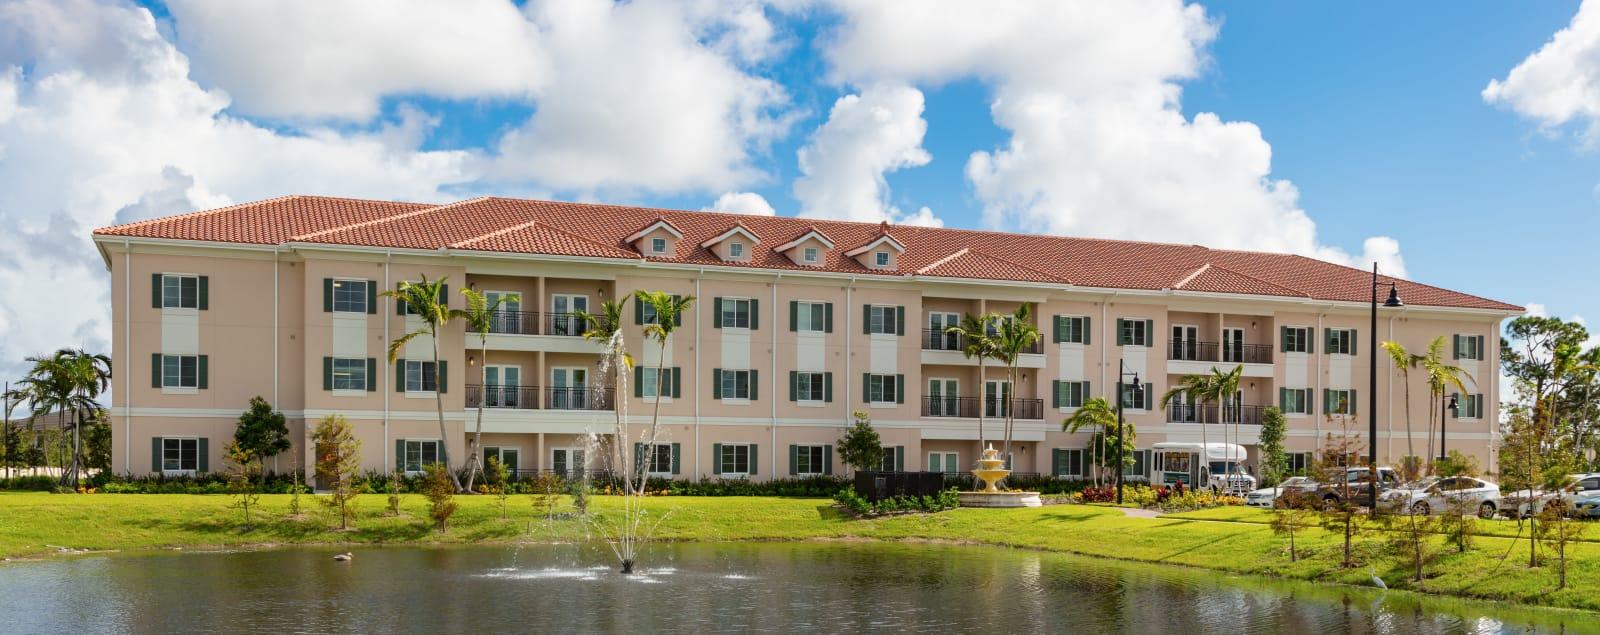 Photo gallery of Senior Living in Palm Beach Gardens